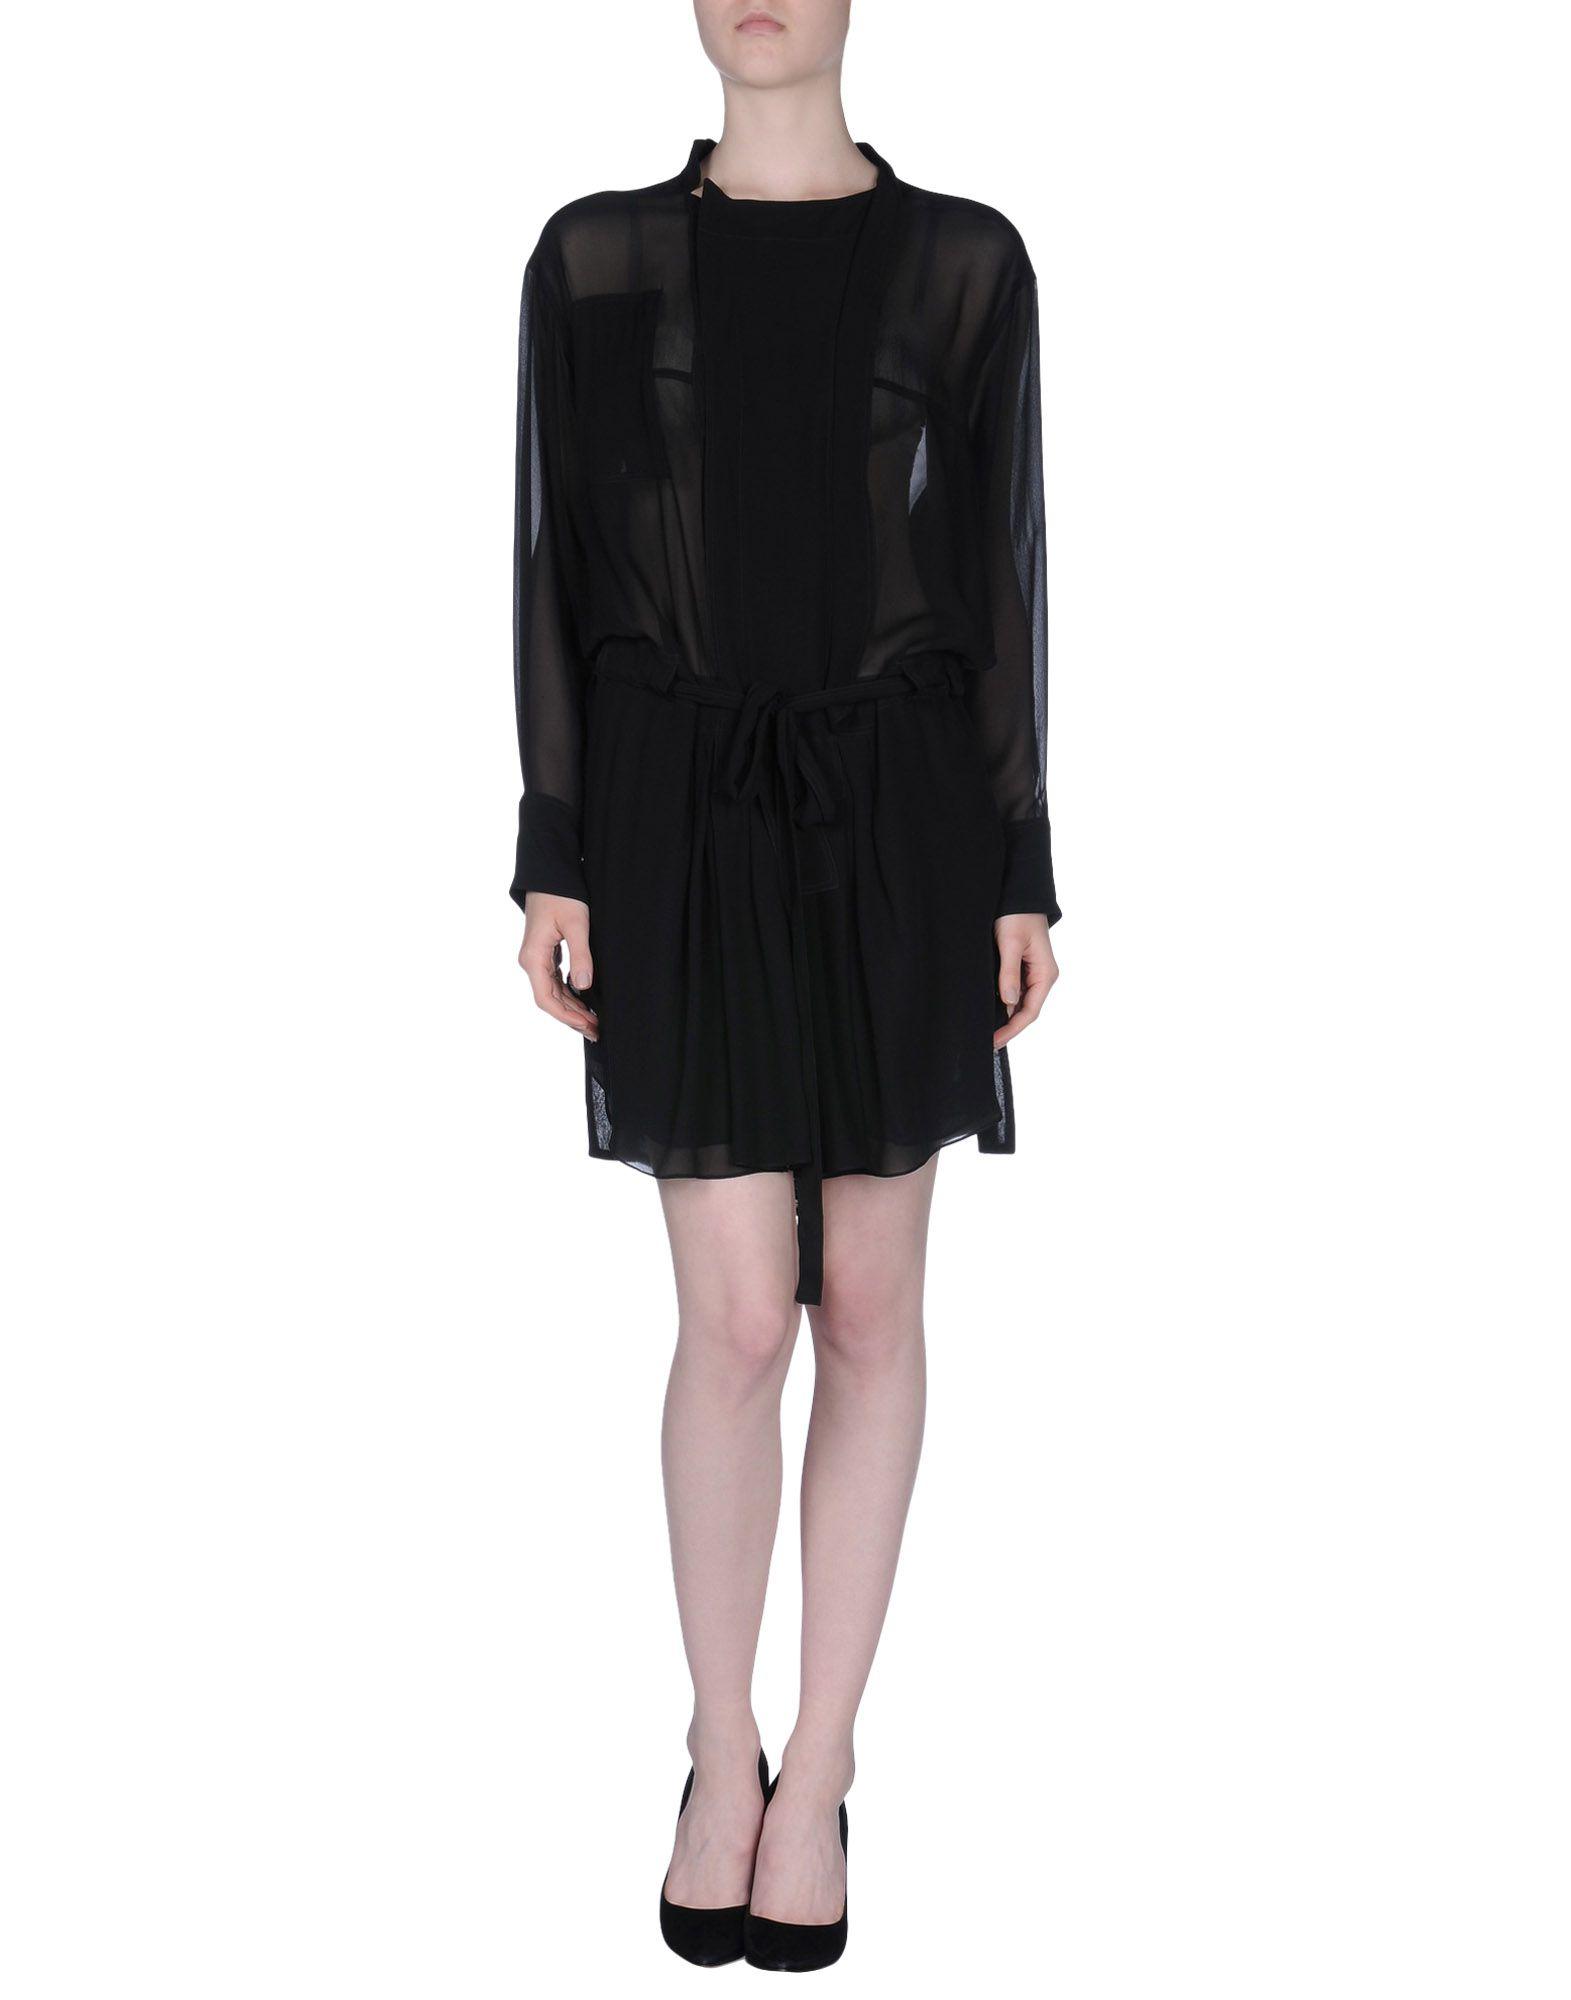 isabel marant short dress in black lyst